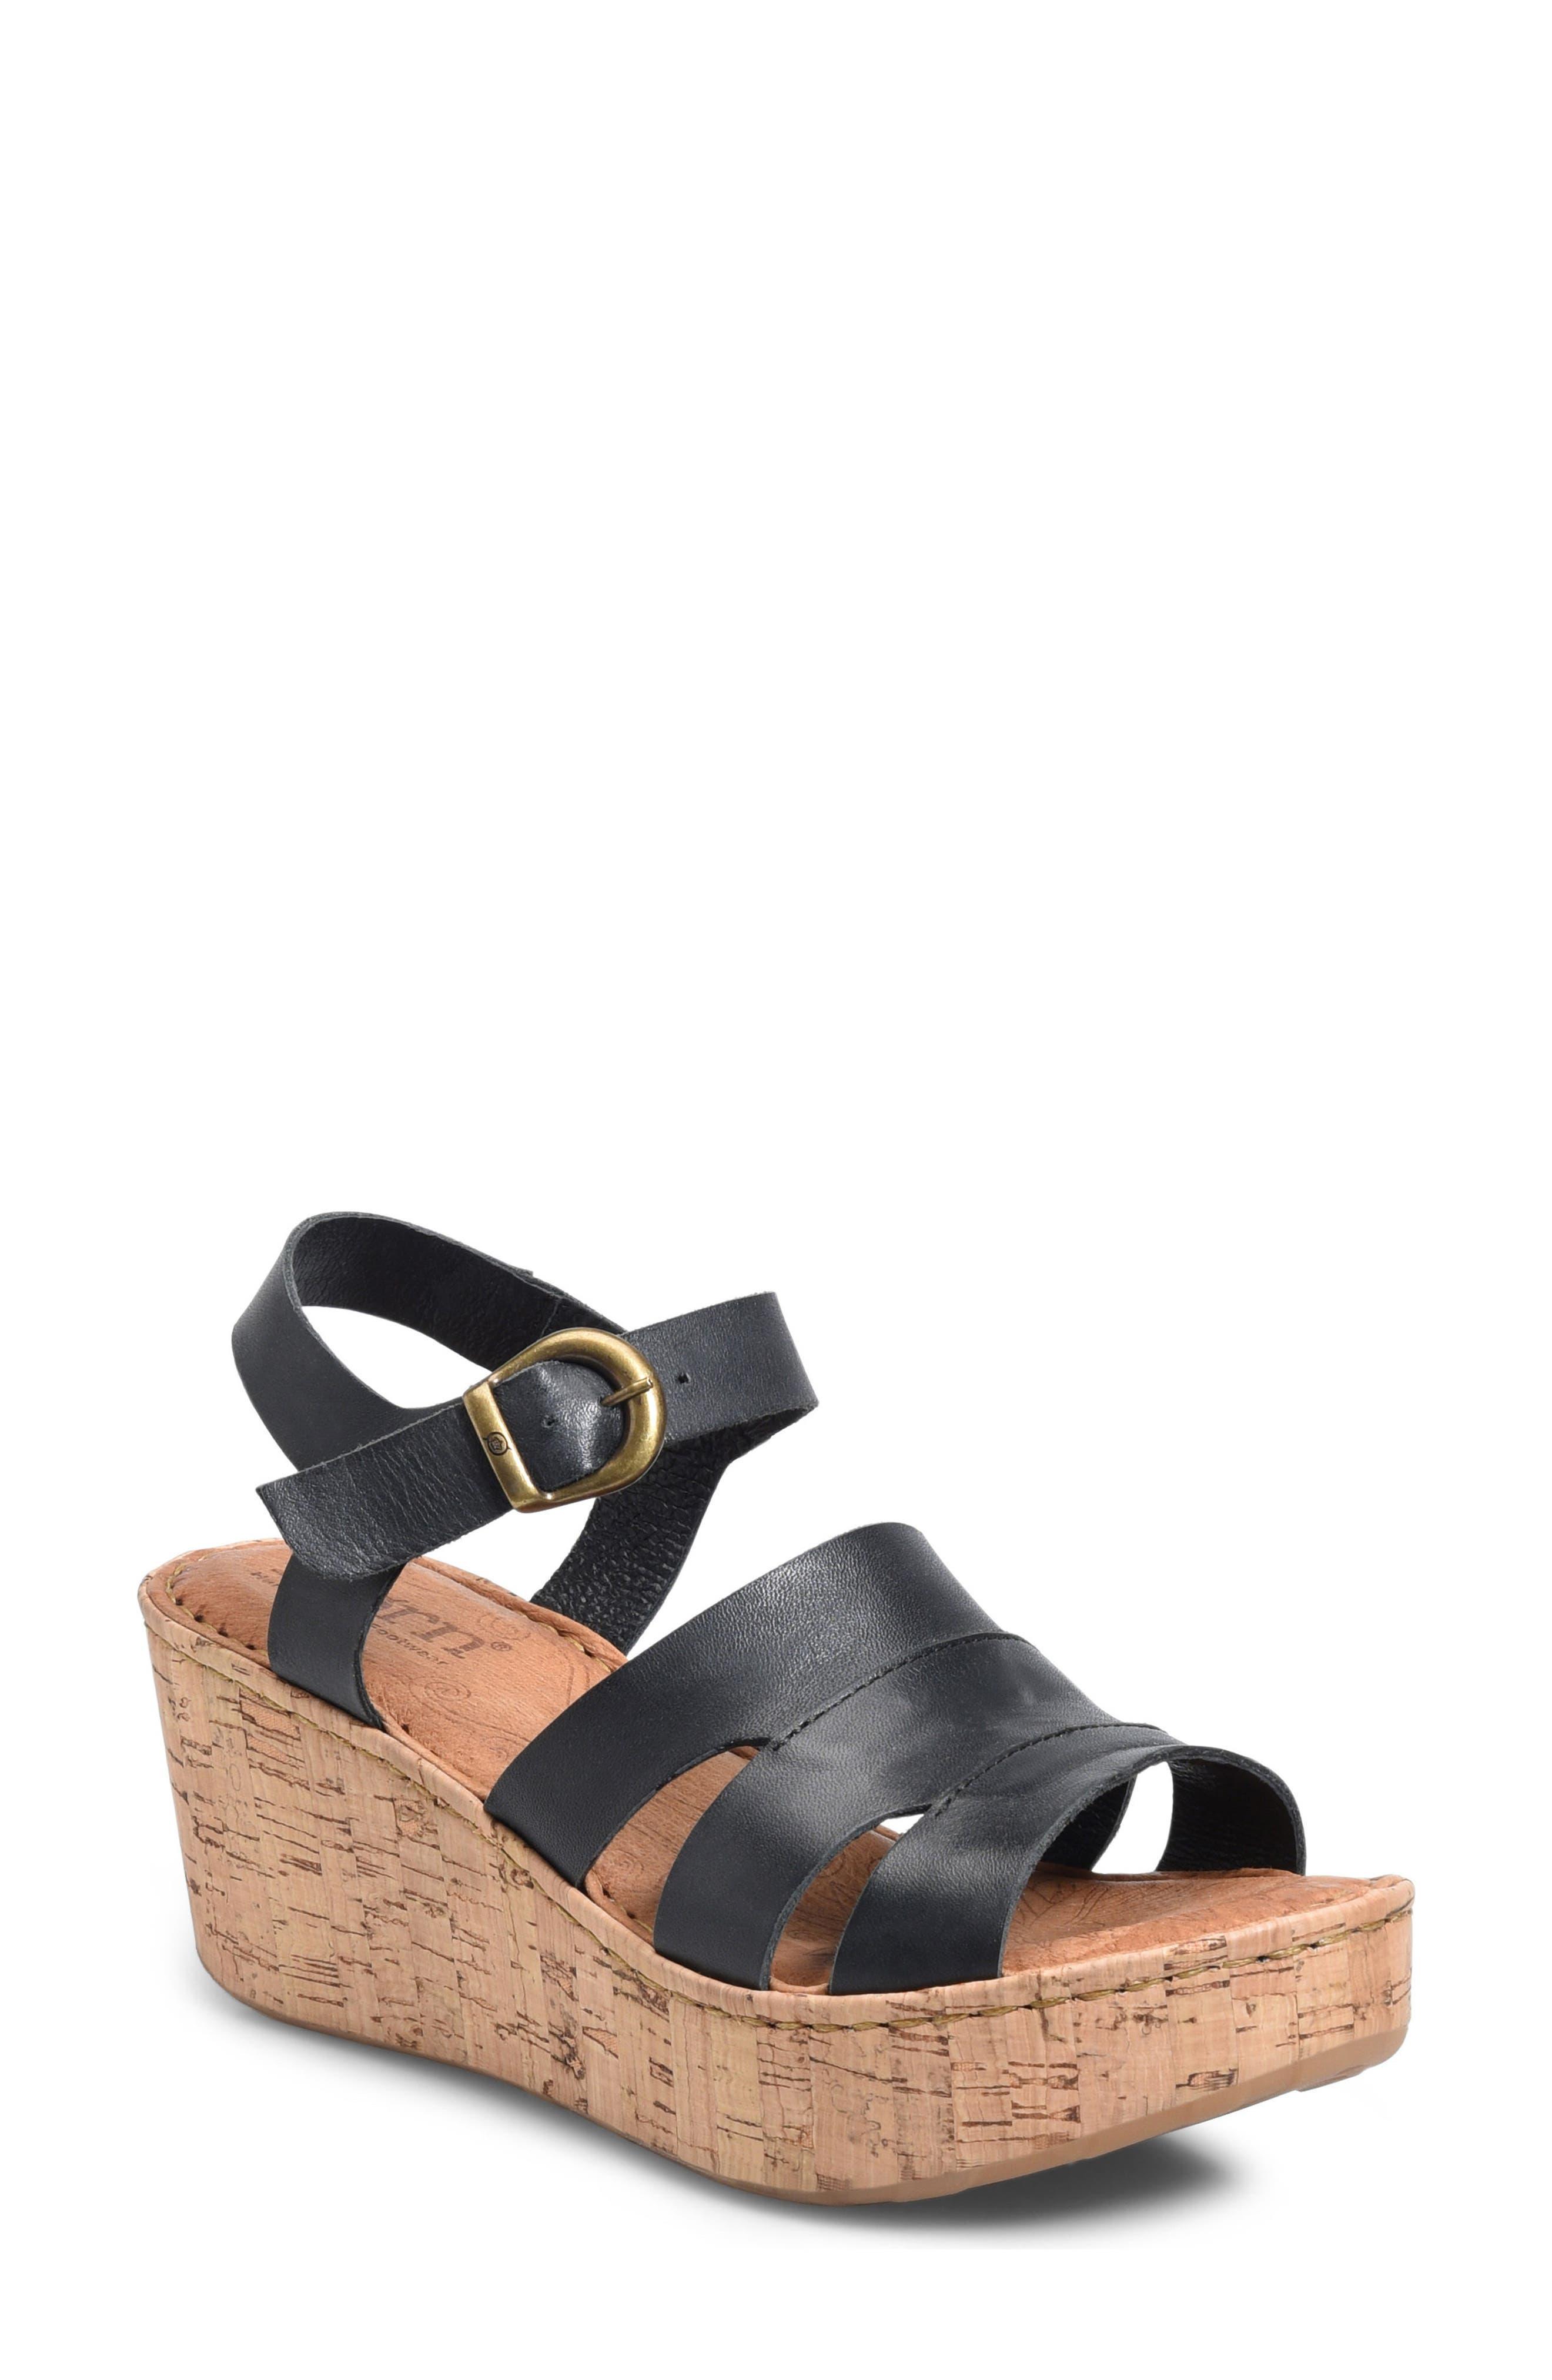 Anori Platform Wedge Sandal,                             Main thumbnail 1, color,                             001